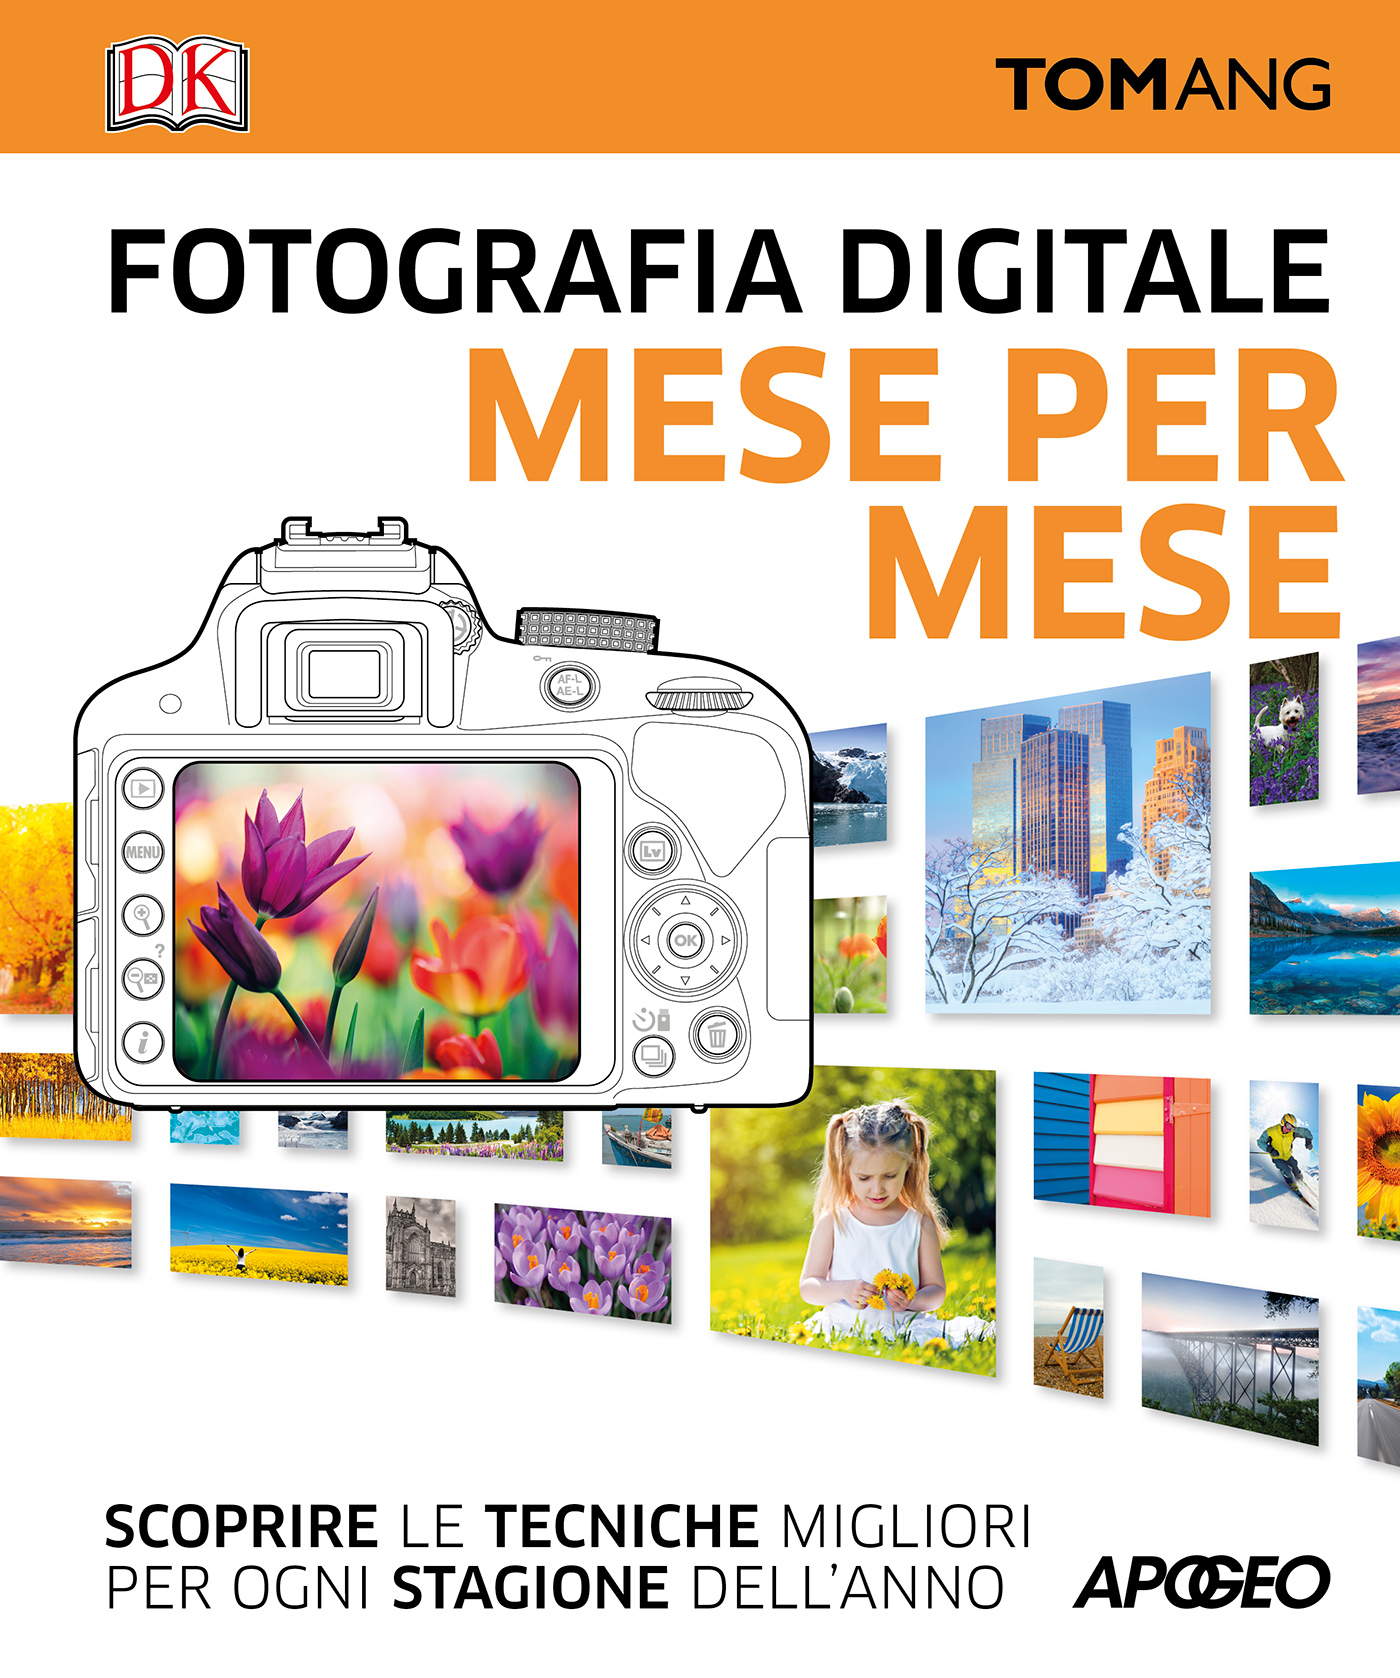 Fotografia digitale mese per mese